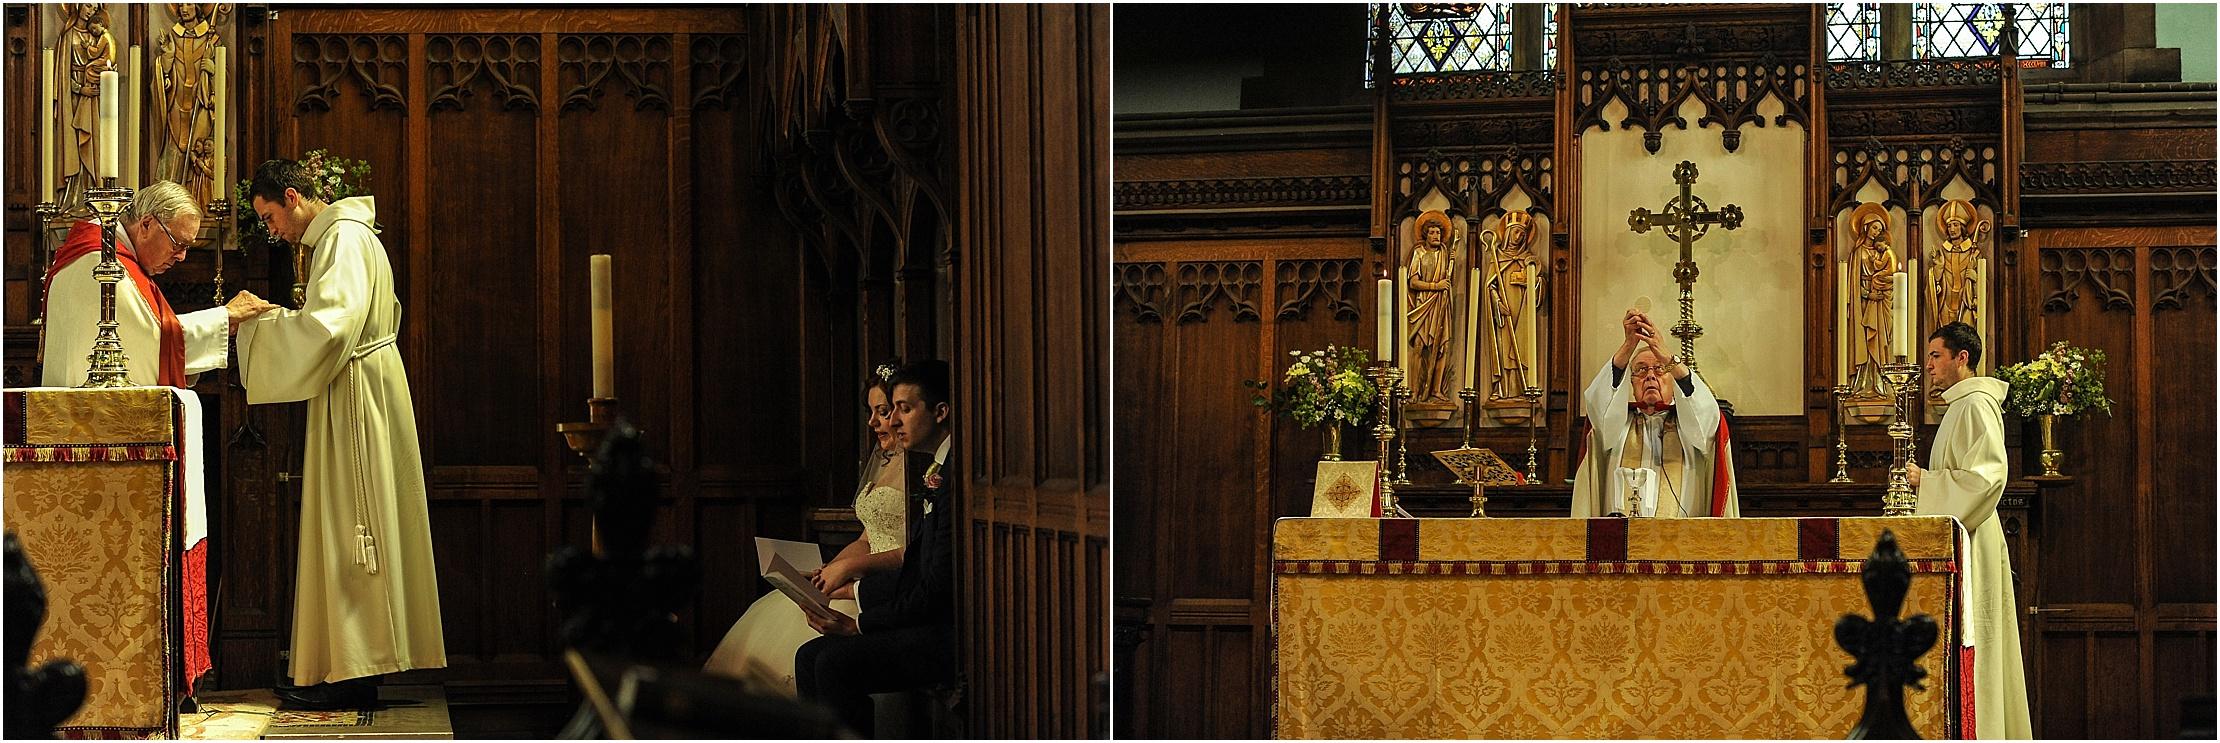 shireburn-arms-wedding- 062.jpg